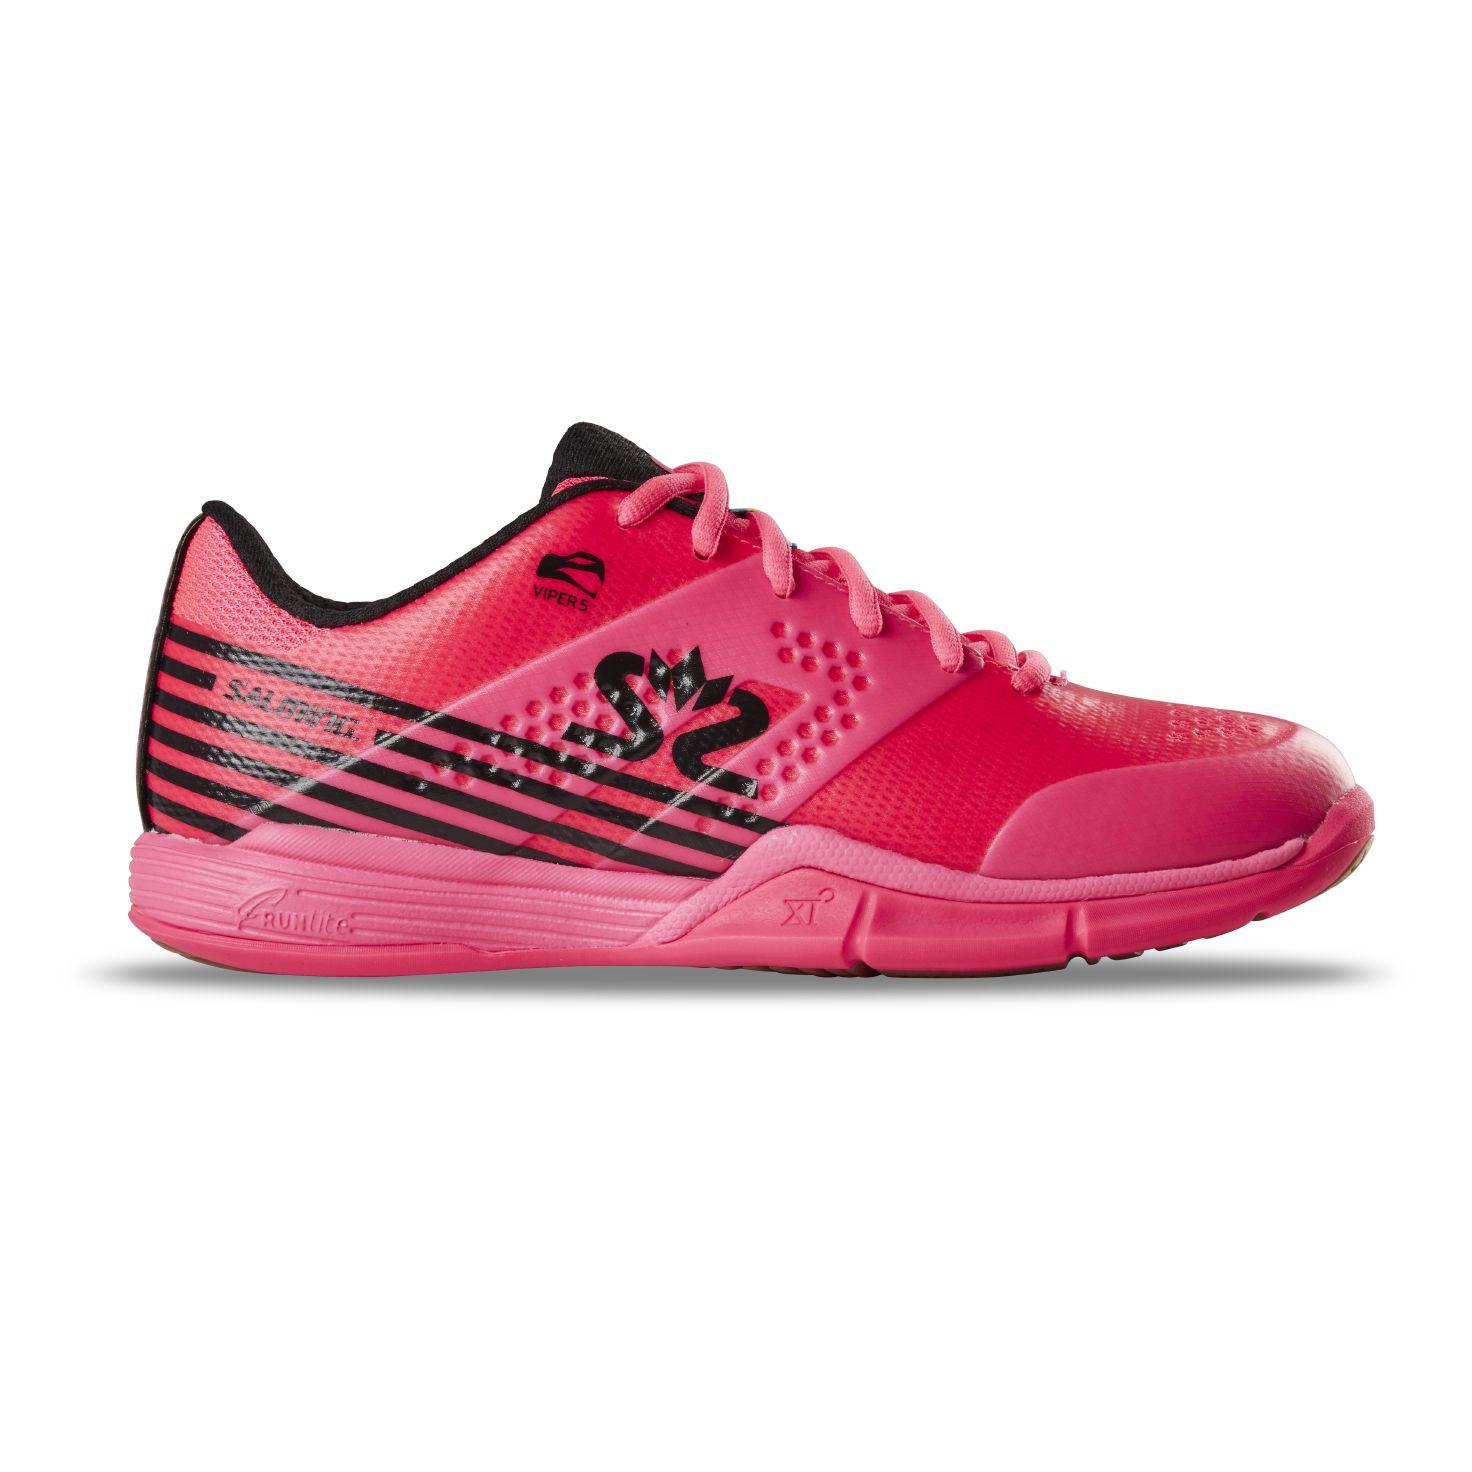 Salming Viper 5 Shoe Women Pink/Black 5 UK - 38 EUR - 24 cm